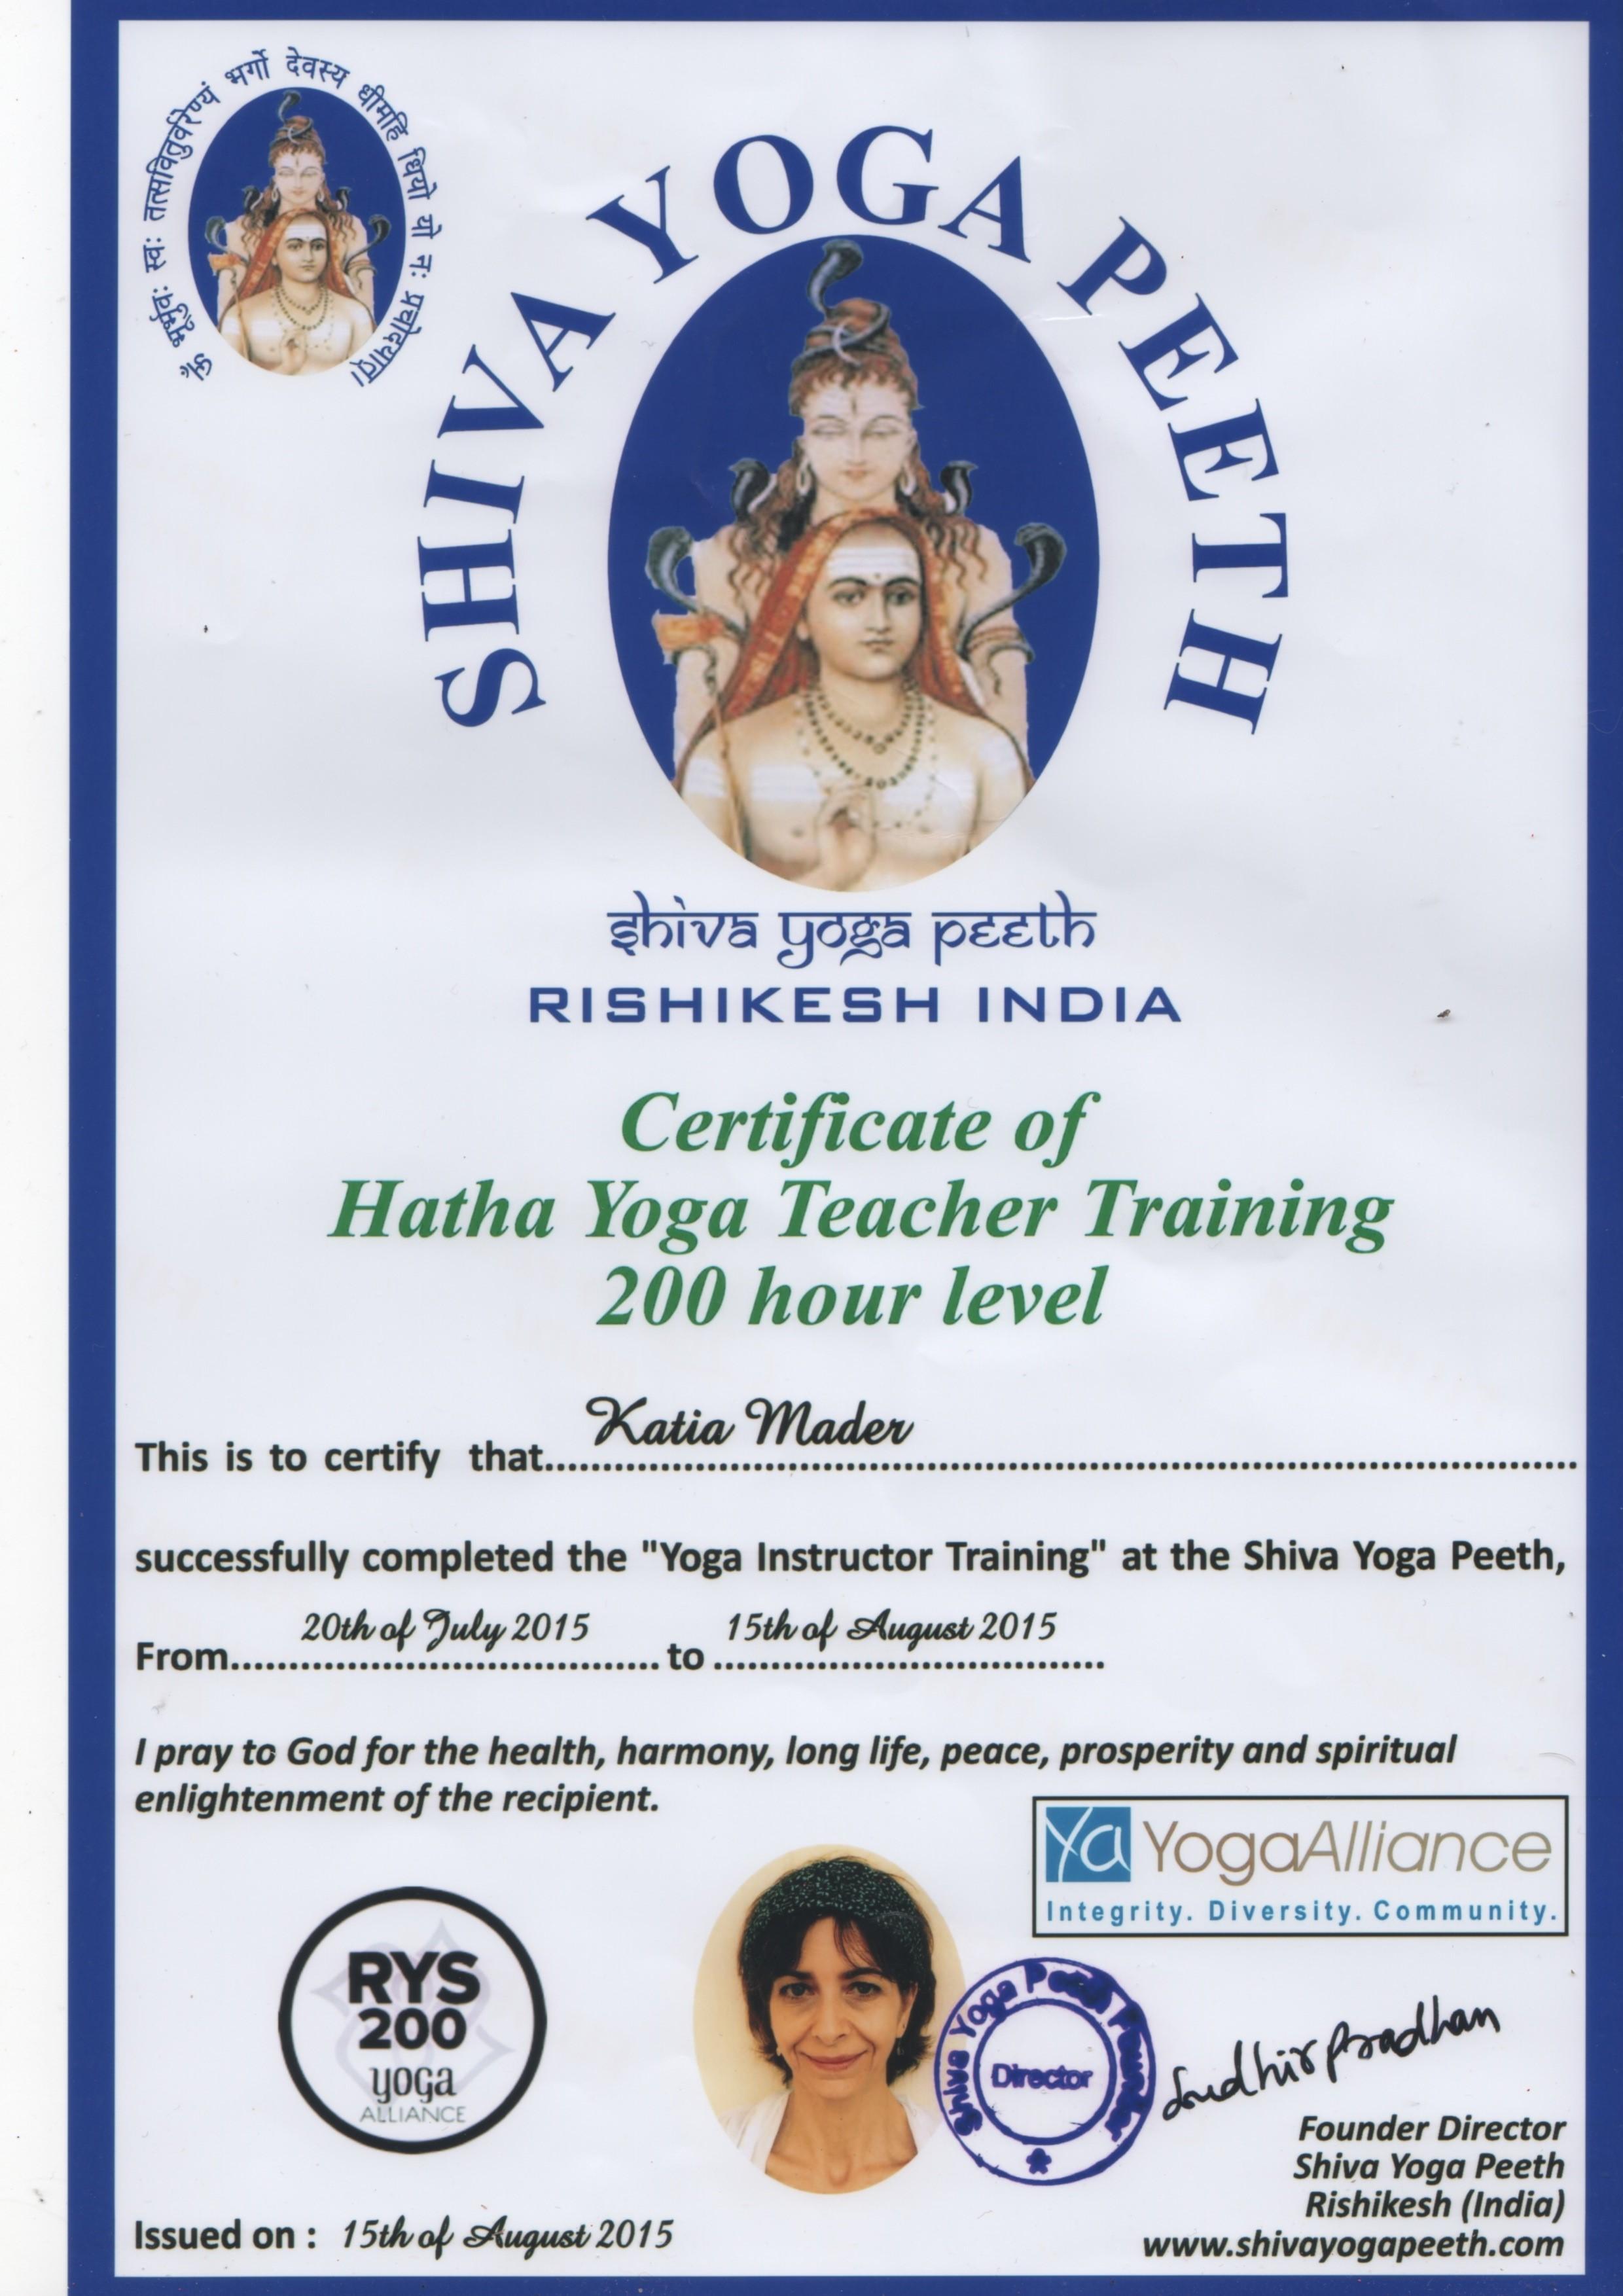 Certificat Yoga Rishikesh India Katia Mader